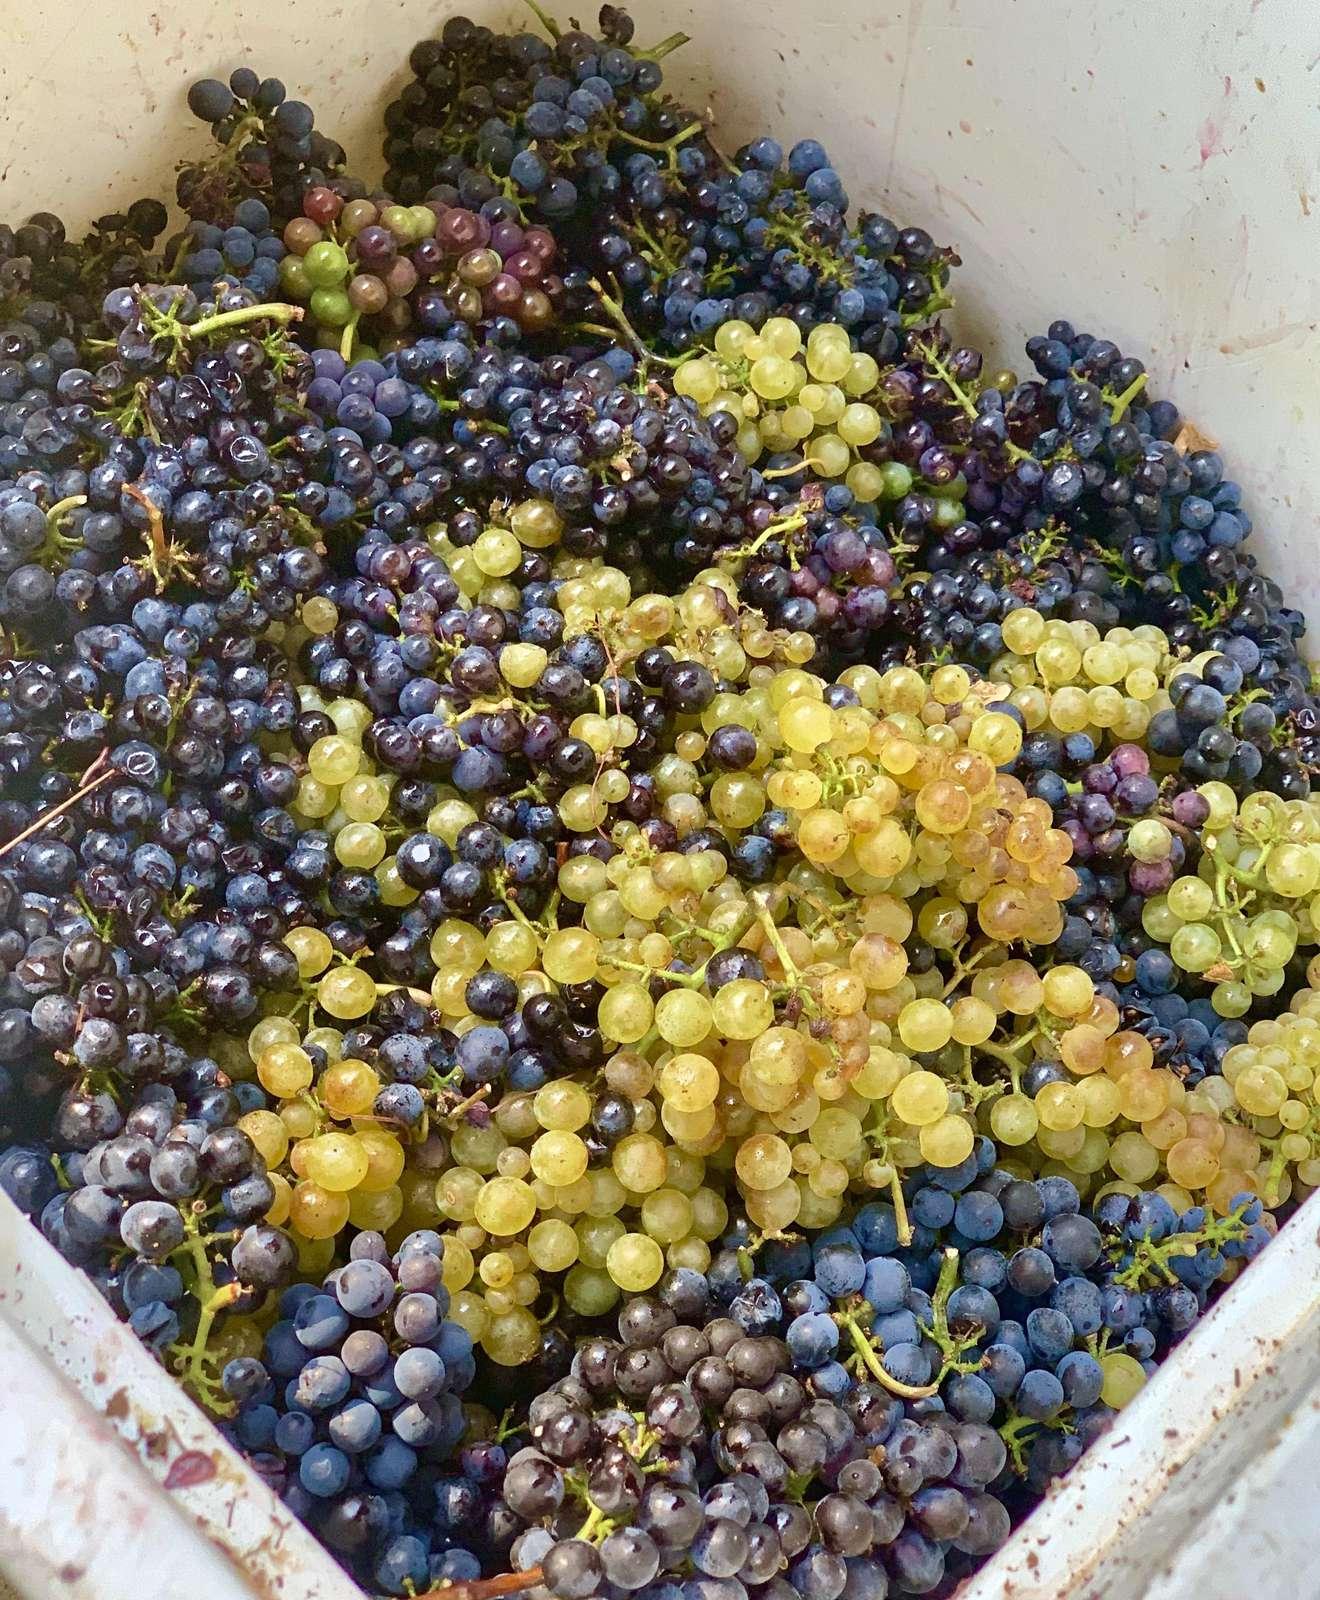 Freshly picked grapes ready for the de-stemmer